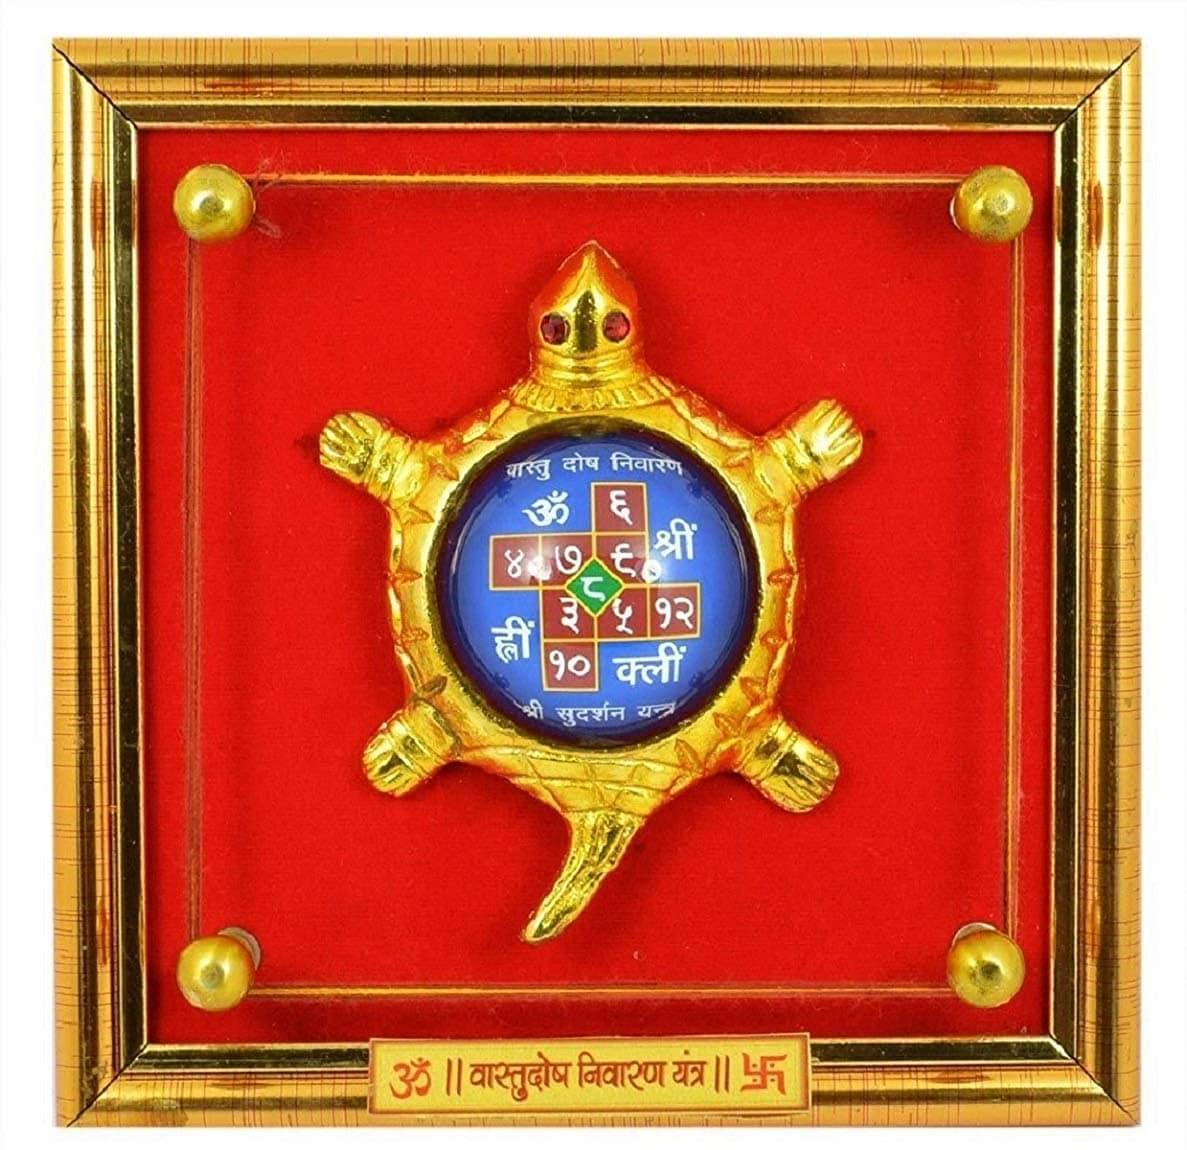 Numeroastro Vastu Dosh Nivaran Yantra On Brass Turtle/Tortoise In Frame For Vastu Correction & Good Luck (Wall Hanging) (17 Cms) (1 Pc)